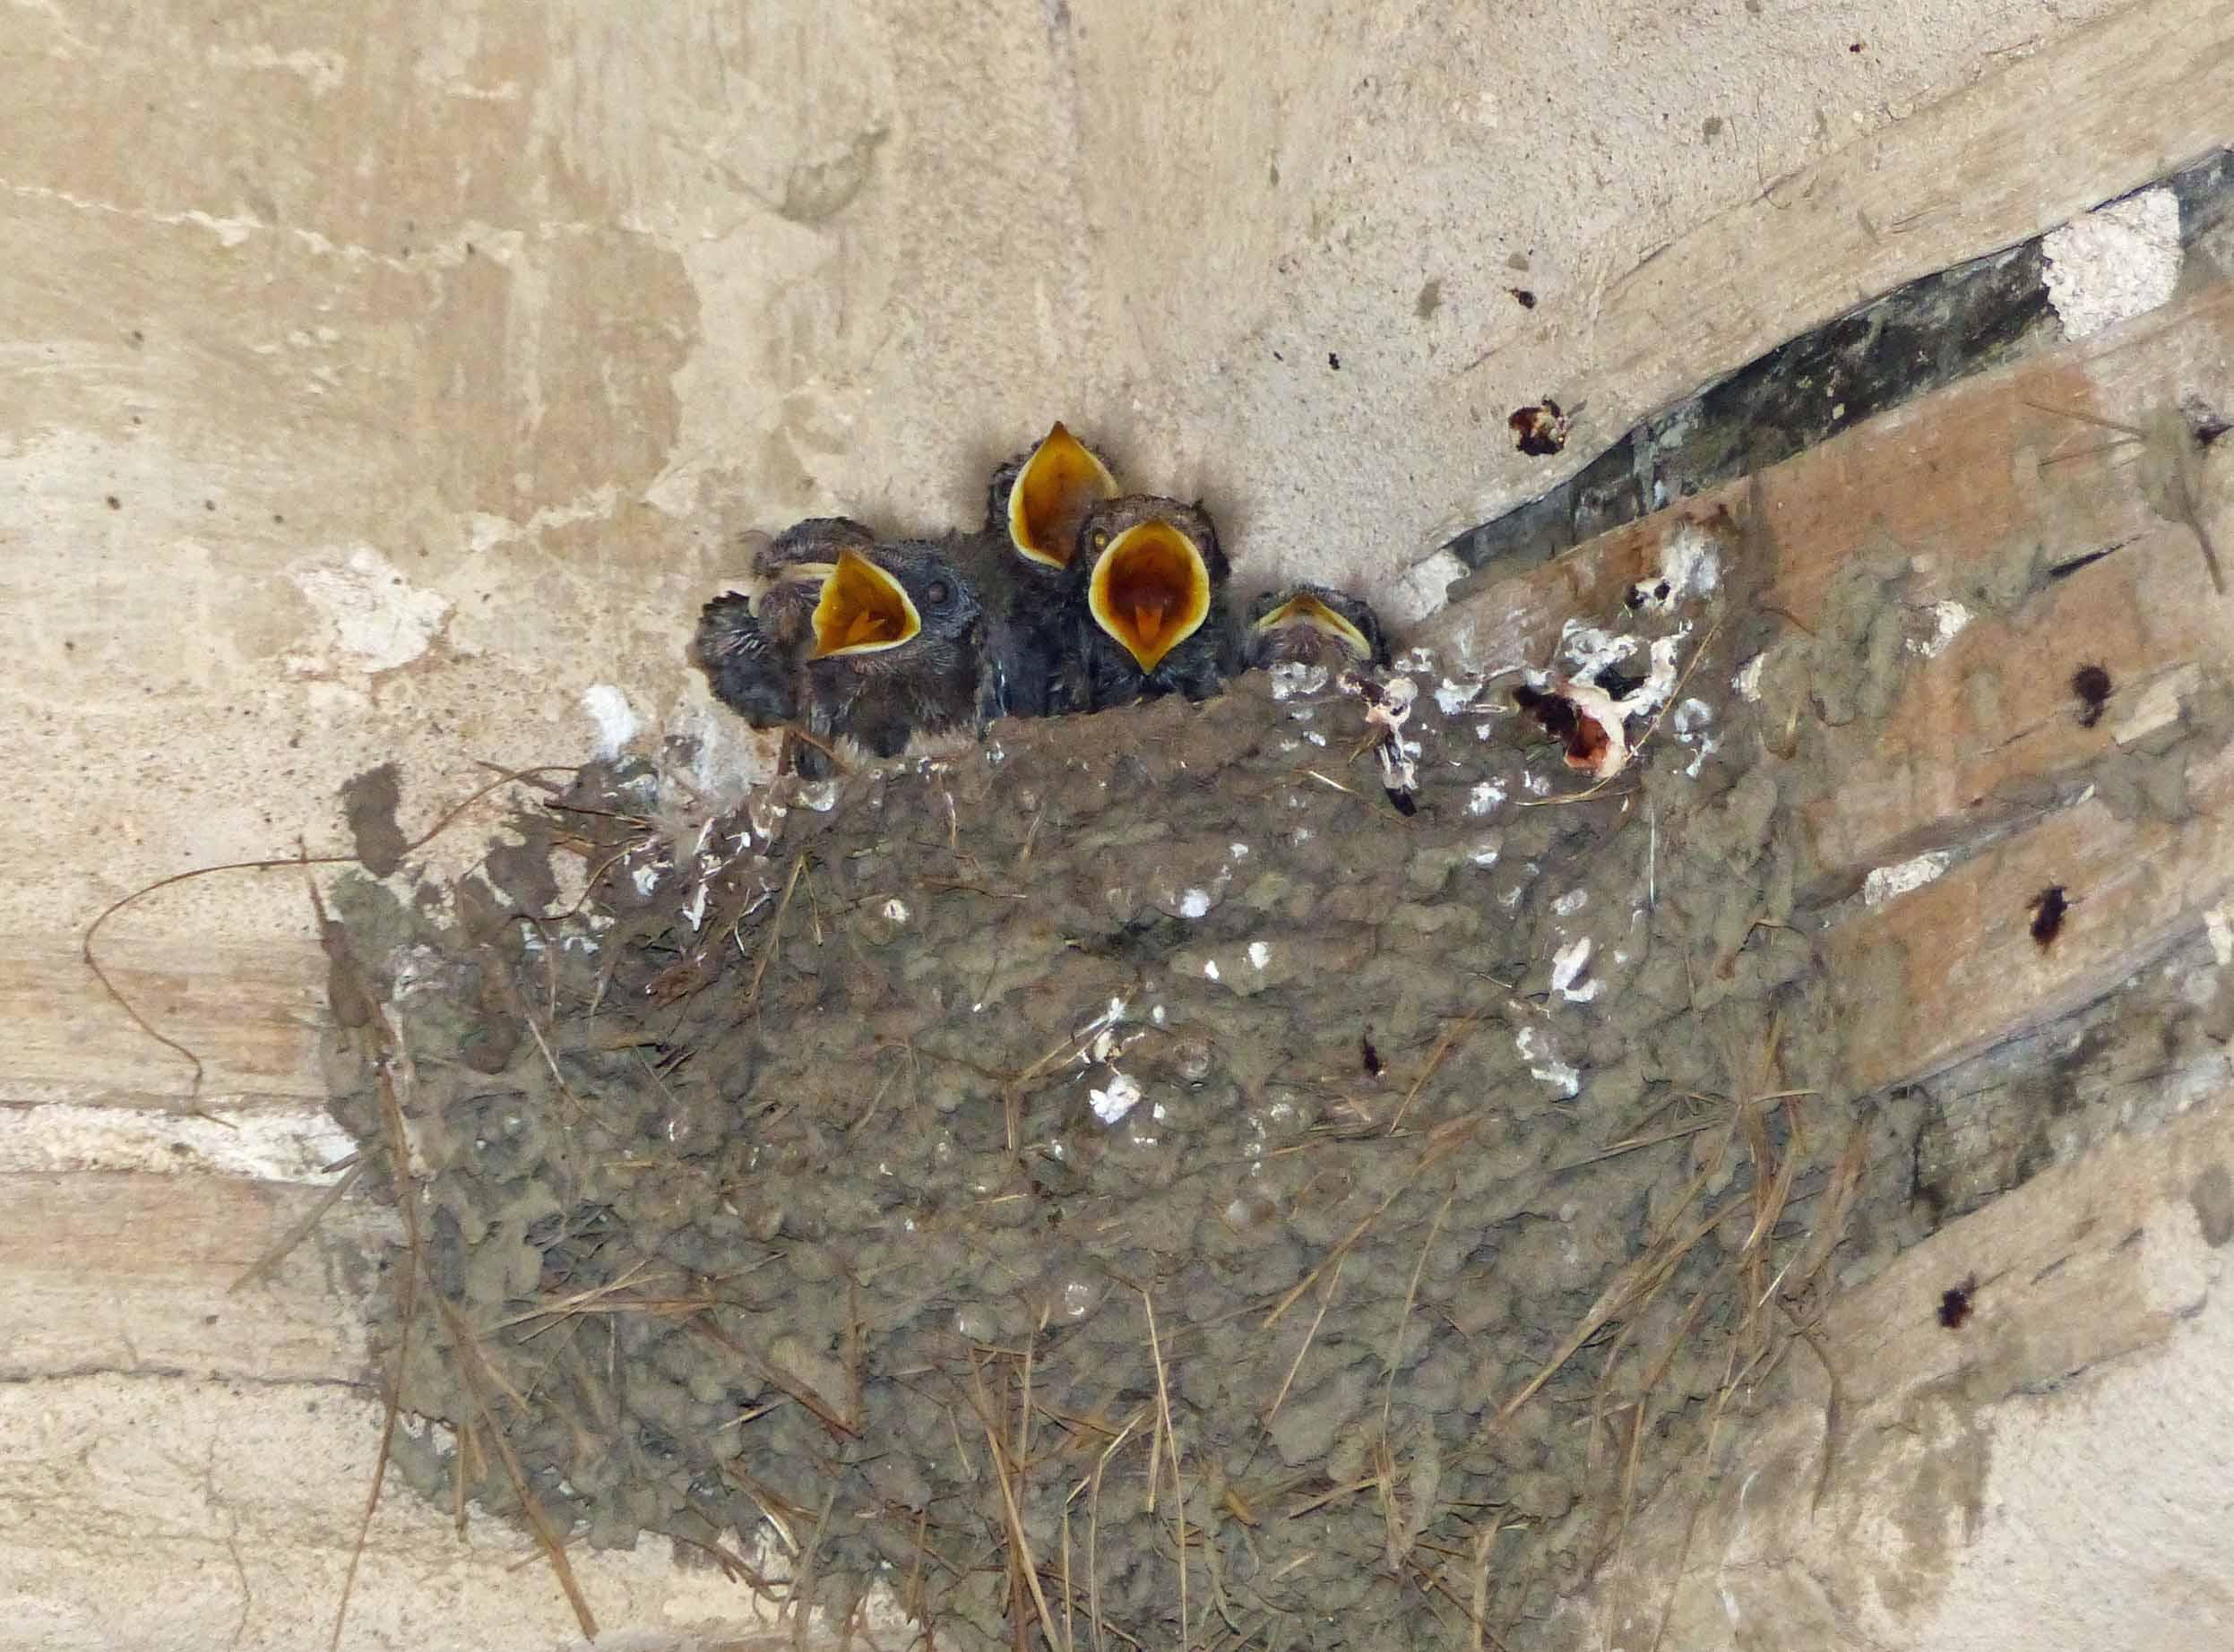 Baby birds in a nest with beaks open